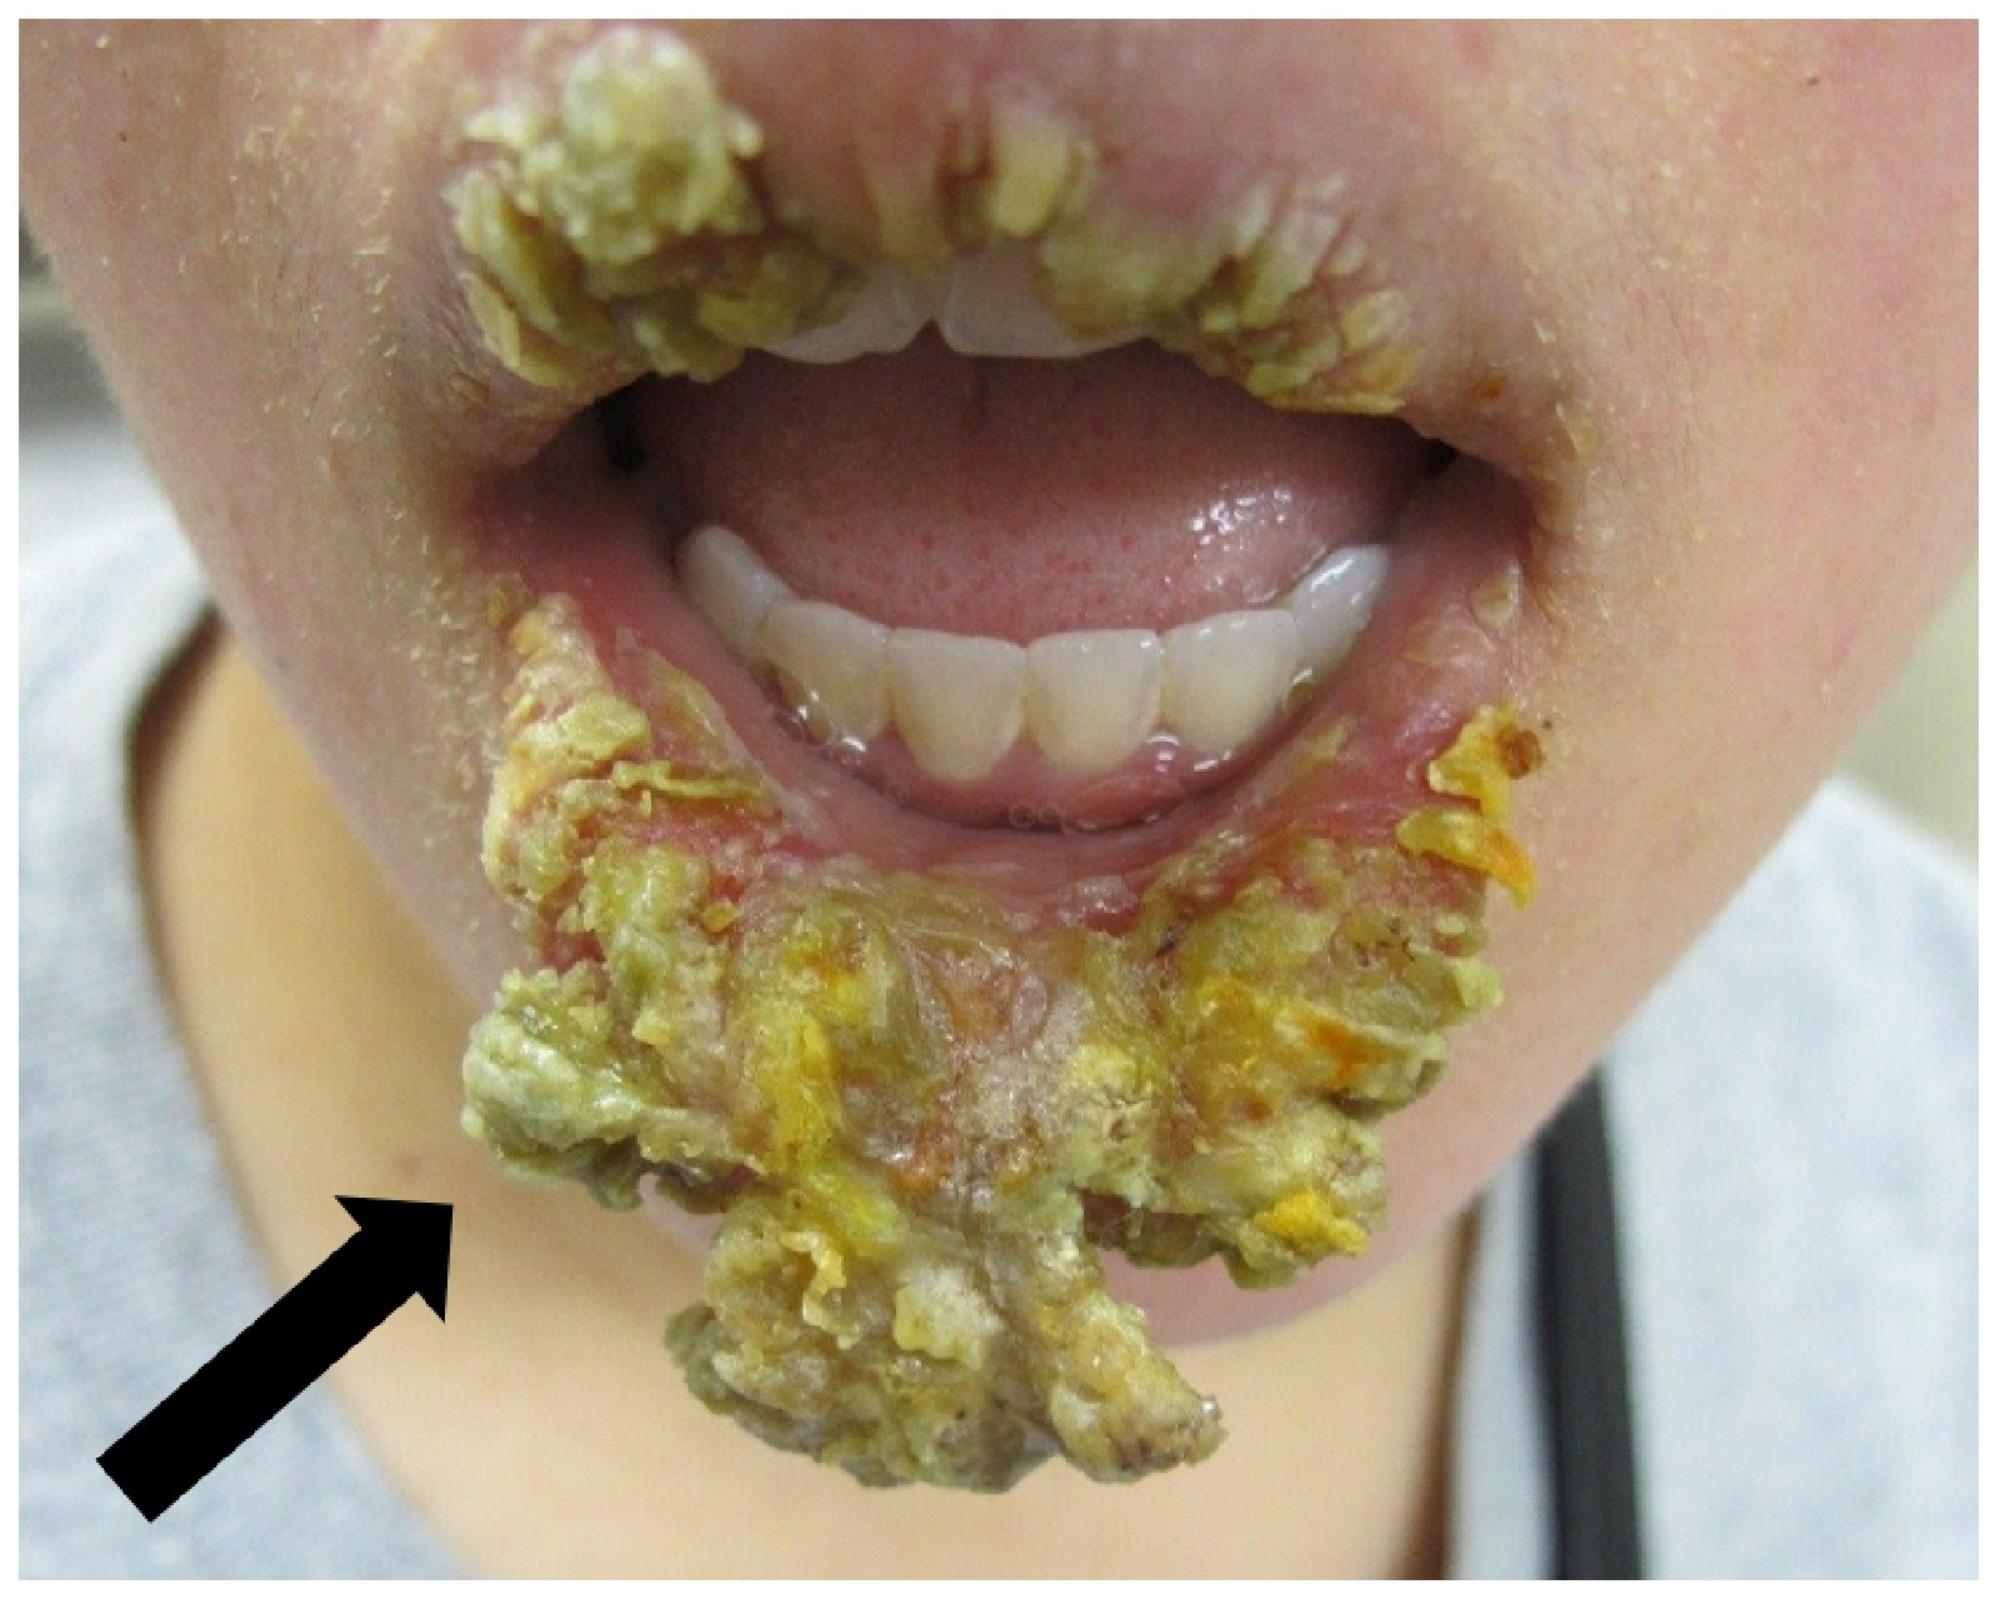 Cureus | Exfoliative Cheilitis as a Manifestation of